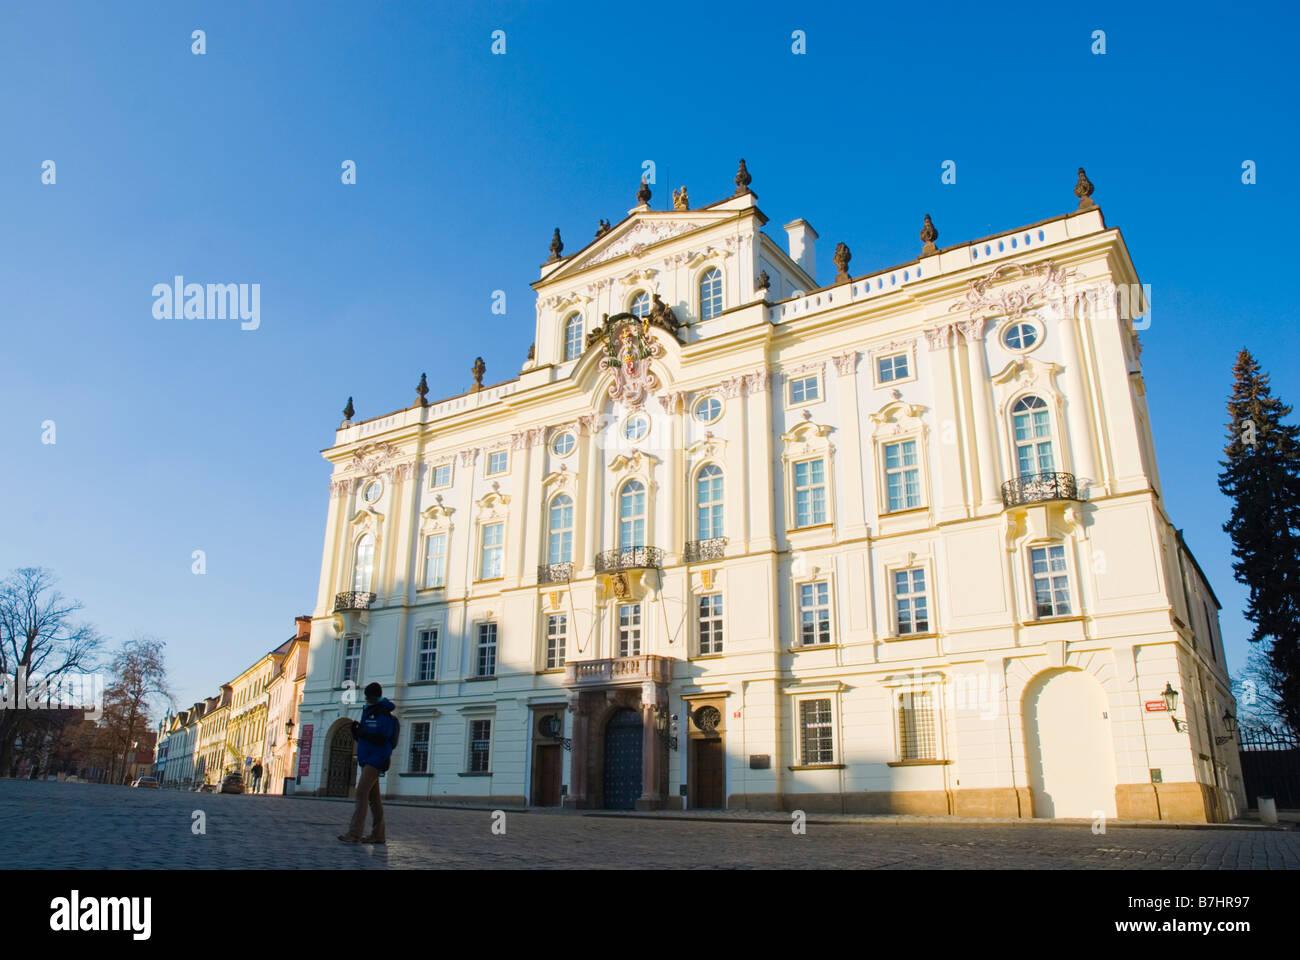 Arcibiskupsky palac at Hradcanske namesti square in Hradcany district of Prague Czech Republic Europe Stock Photo